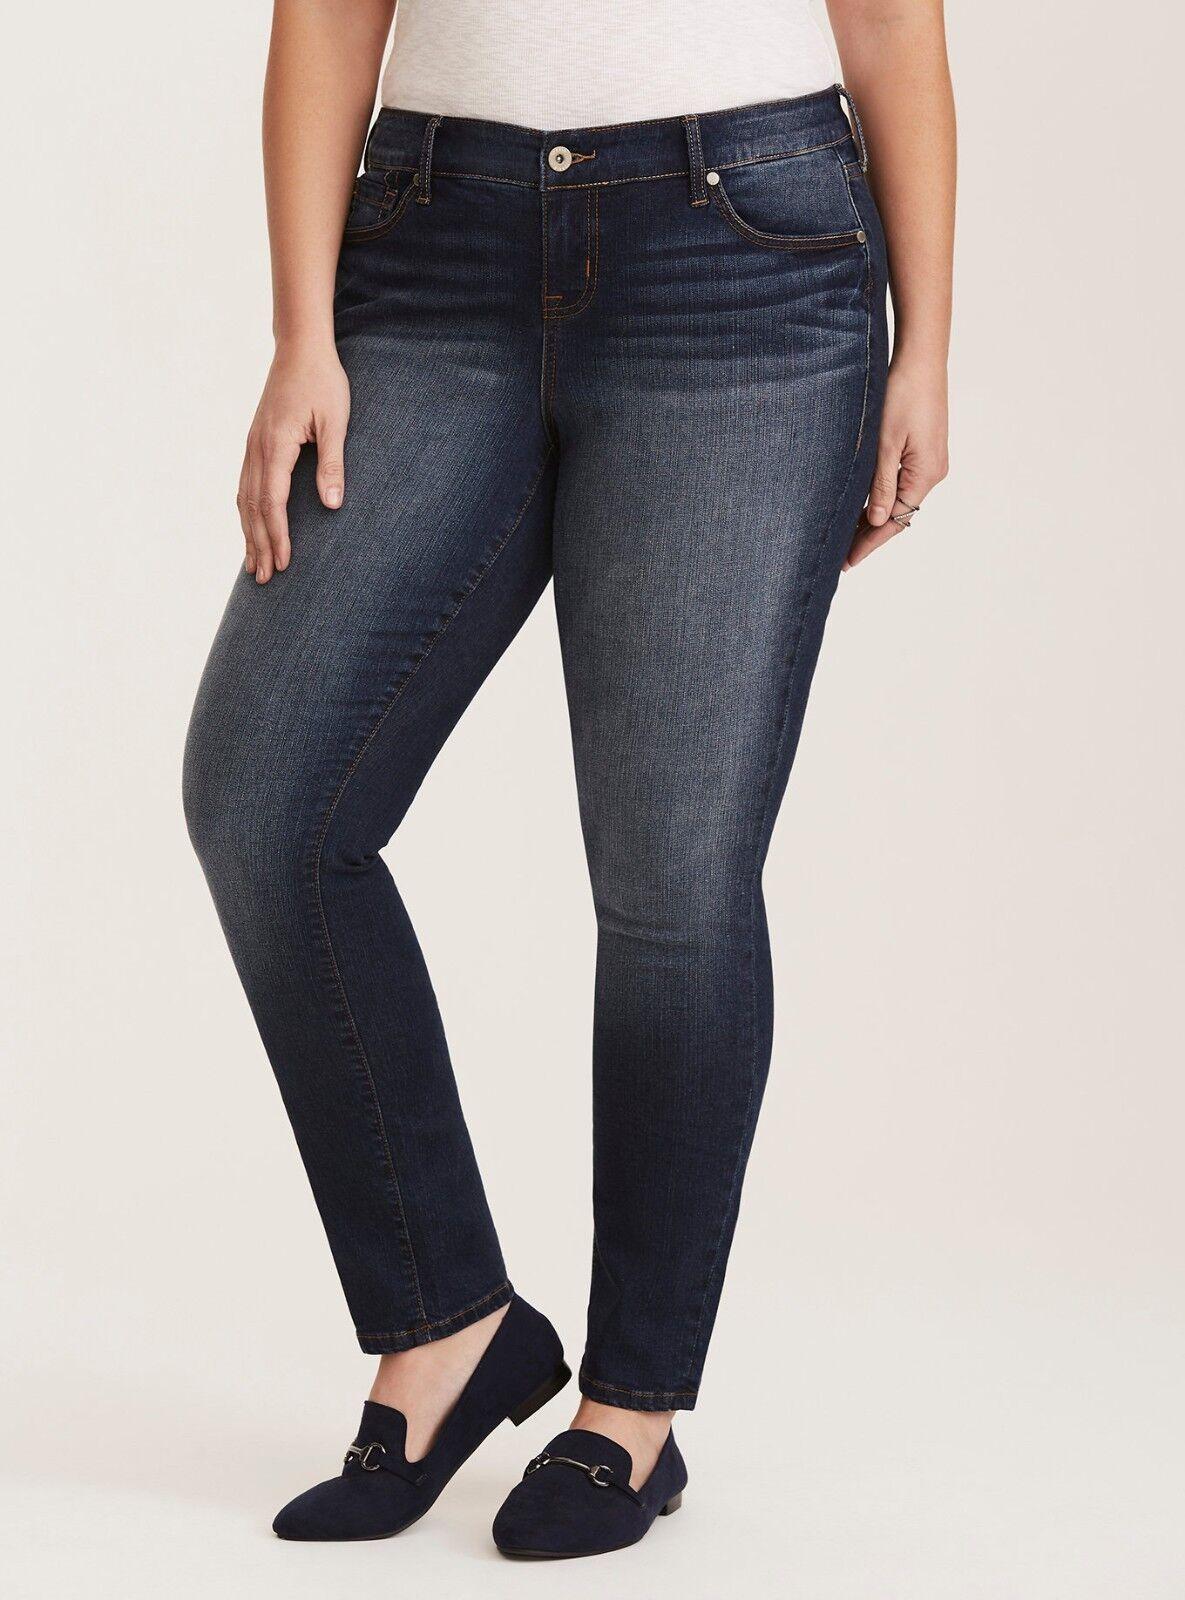 Torrid Skinny Jeans Size 22 Classic Fit Dark Wash Fading Plus Regular